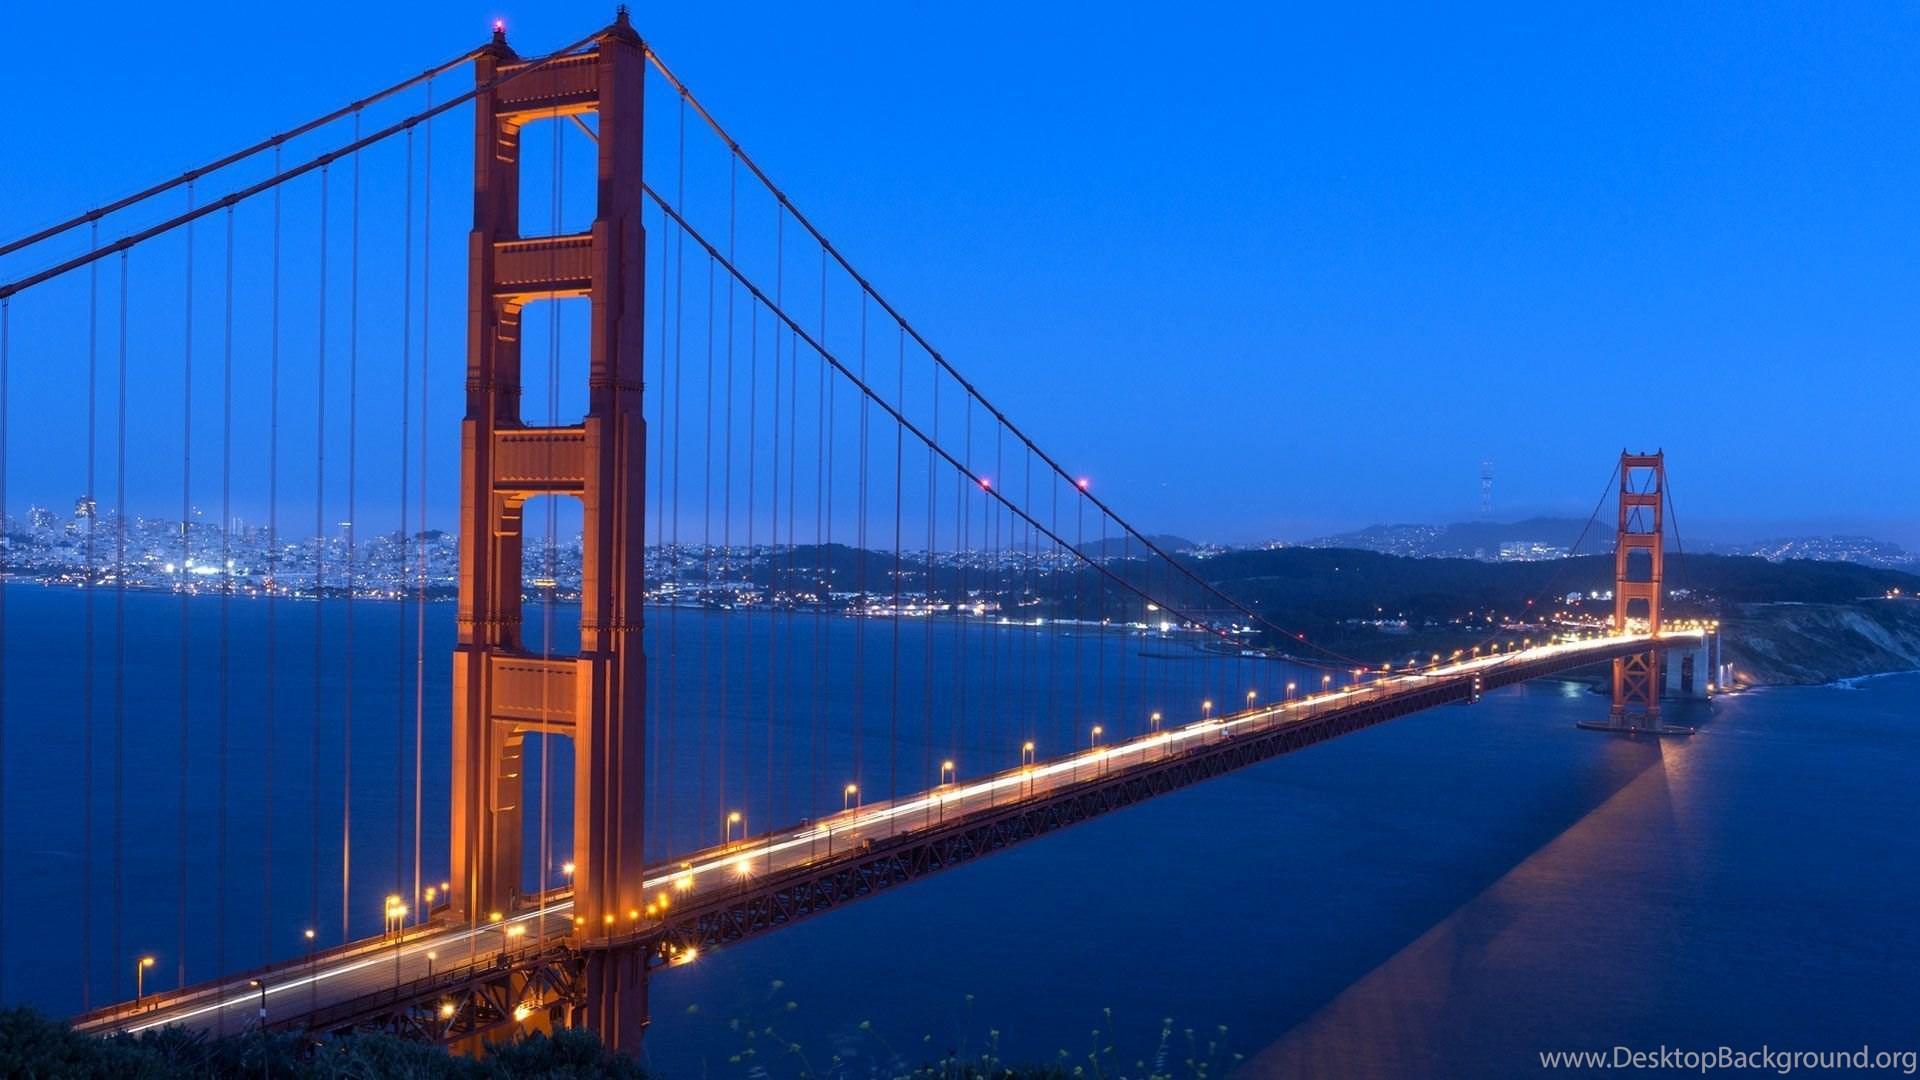 Popular Wallpaper Night Golden Gate Bridge - 134282_golden-gate-bridge-night-wallpapers-hd-1080p-for-desktop_1920x1080_h  Graphic-377664.jpg